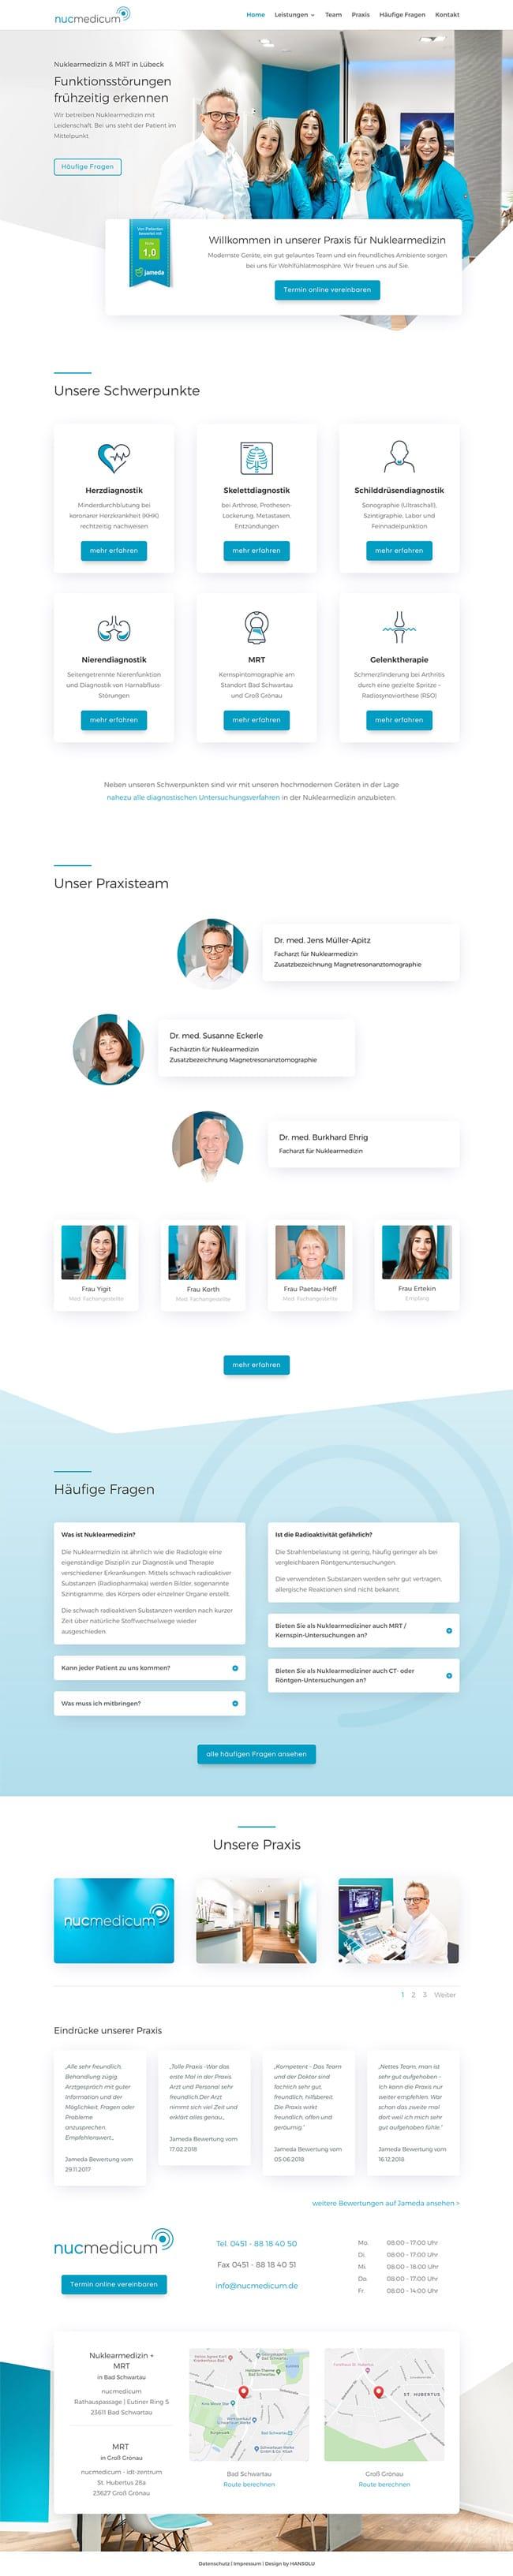 Modernes Webdesign für Arztpraxis / Arzt - nucmedicum